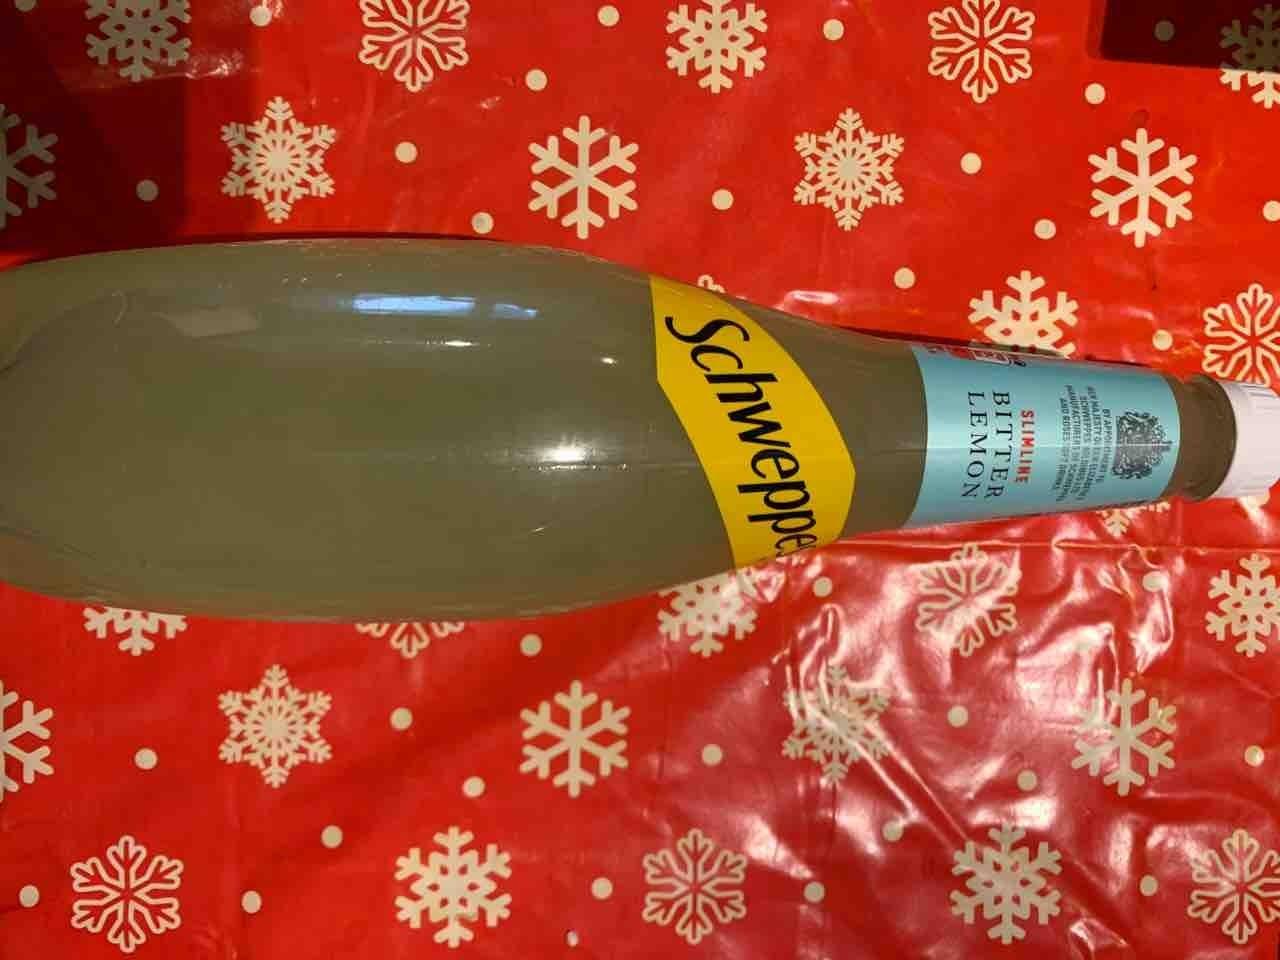 Large bitter lemon drink